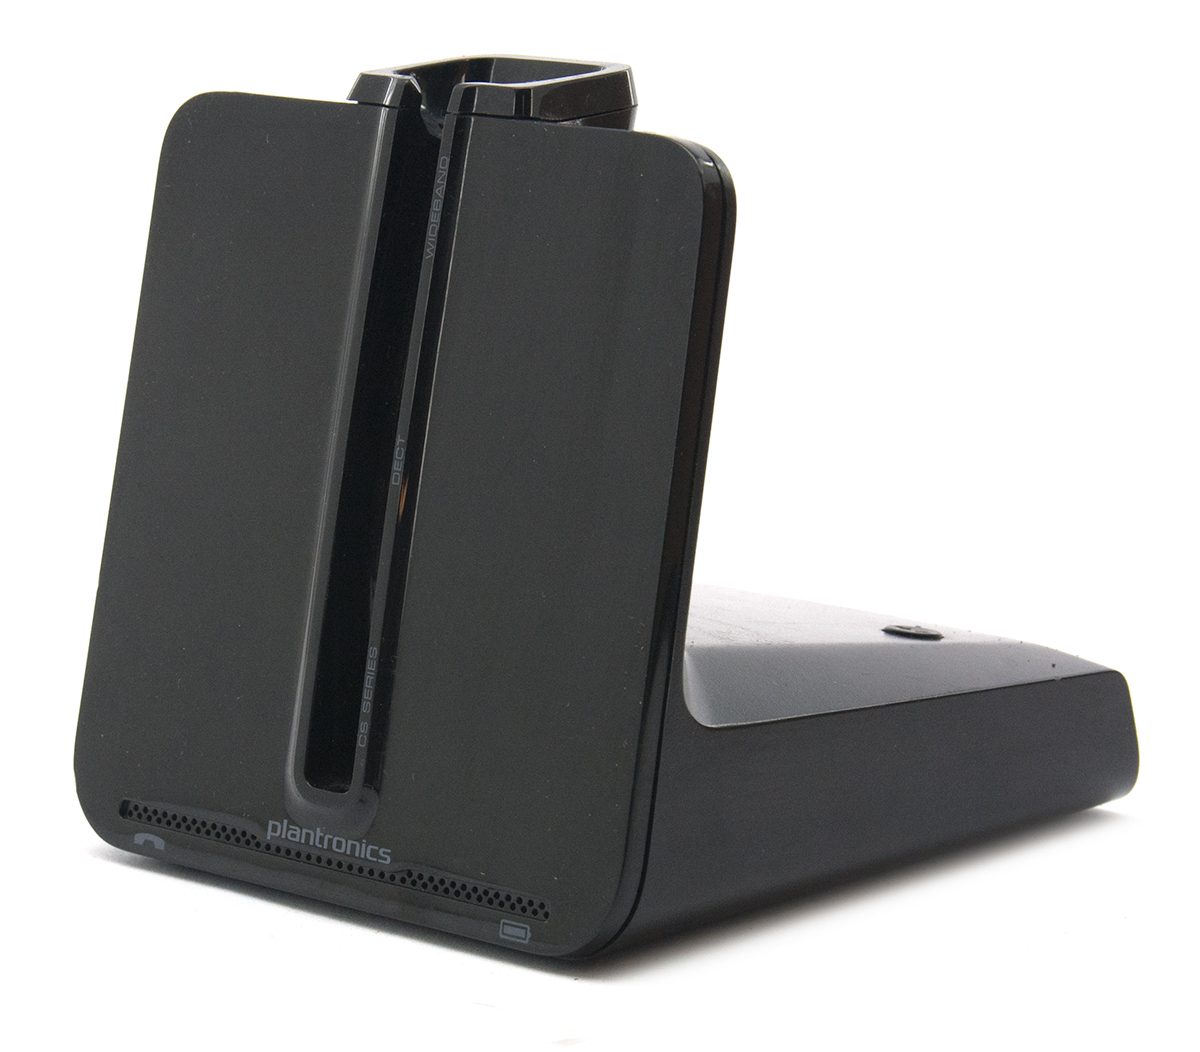 Plantronics Cs540 Wireless Dect Headset Base Only